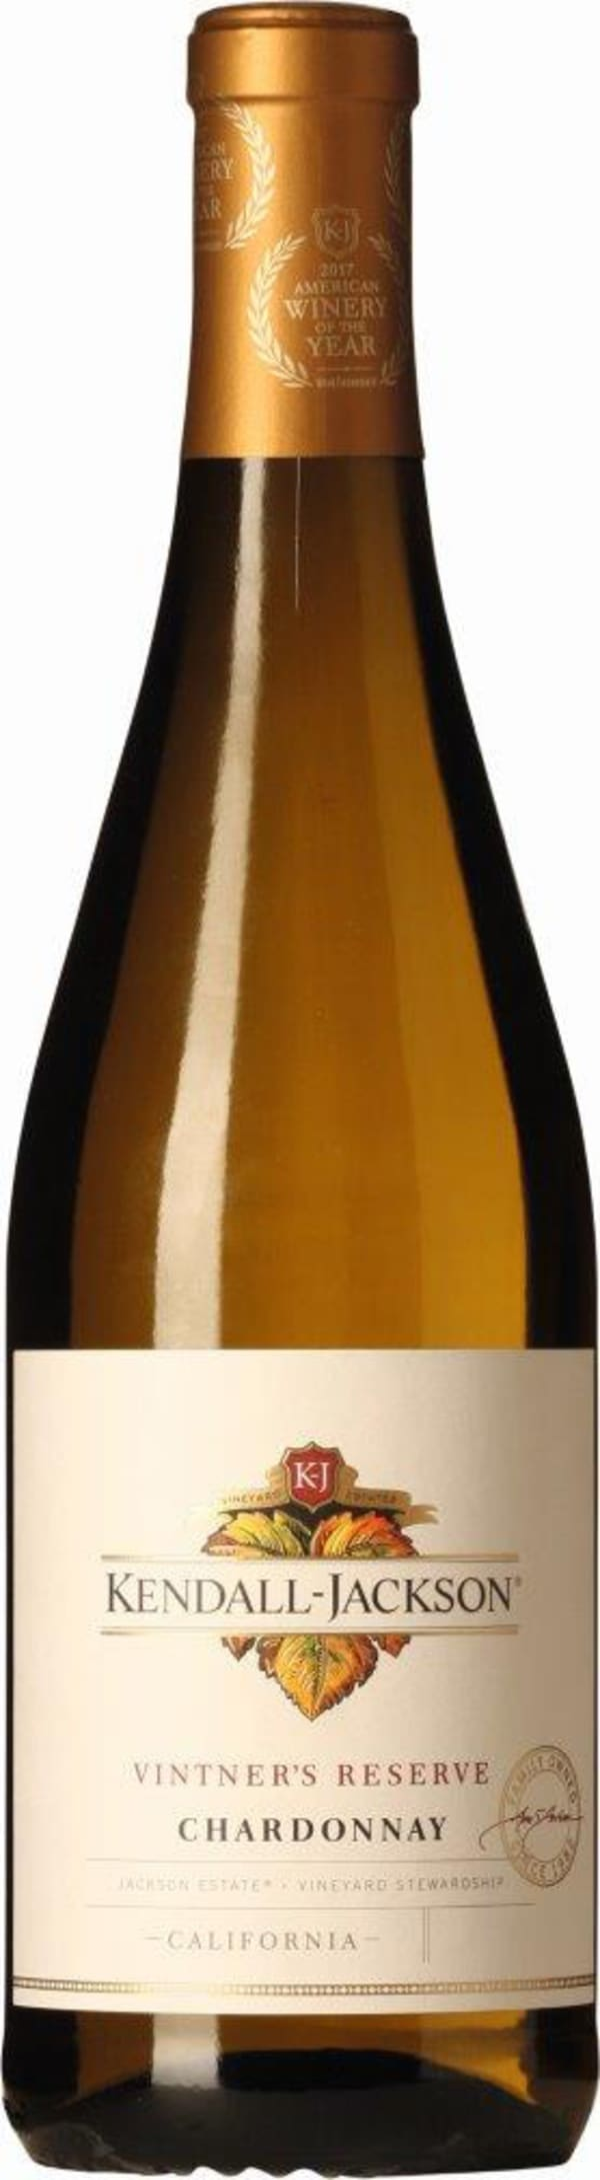 Kendall Jackson Vintner´s Reserve Chardonnay 2015